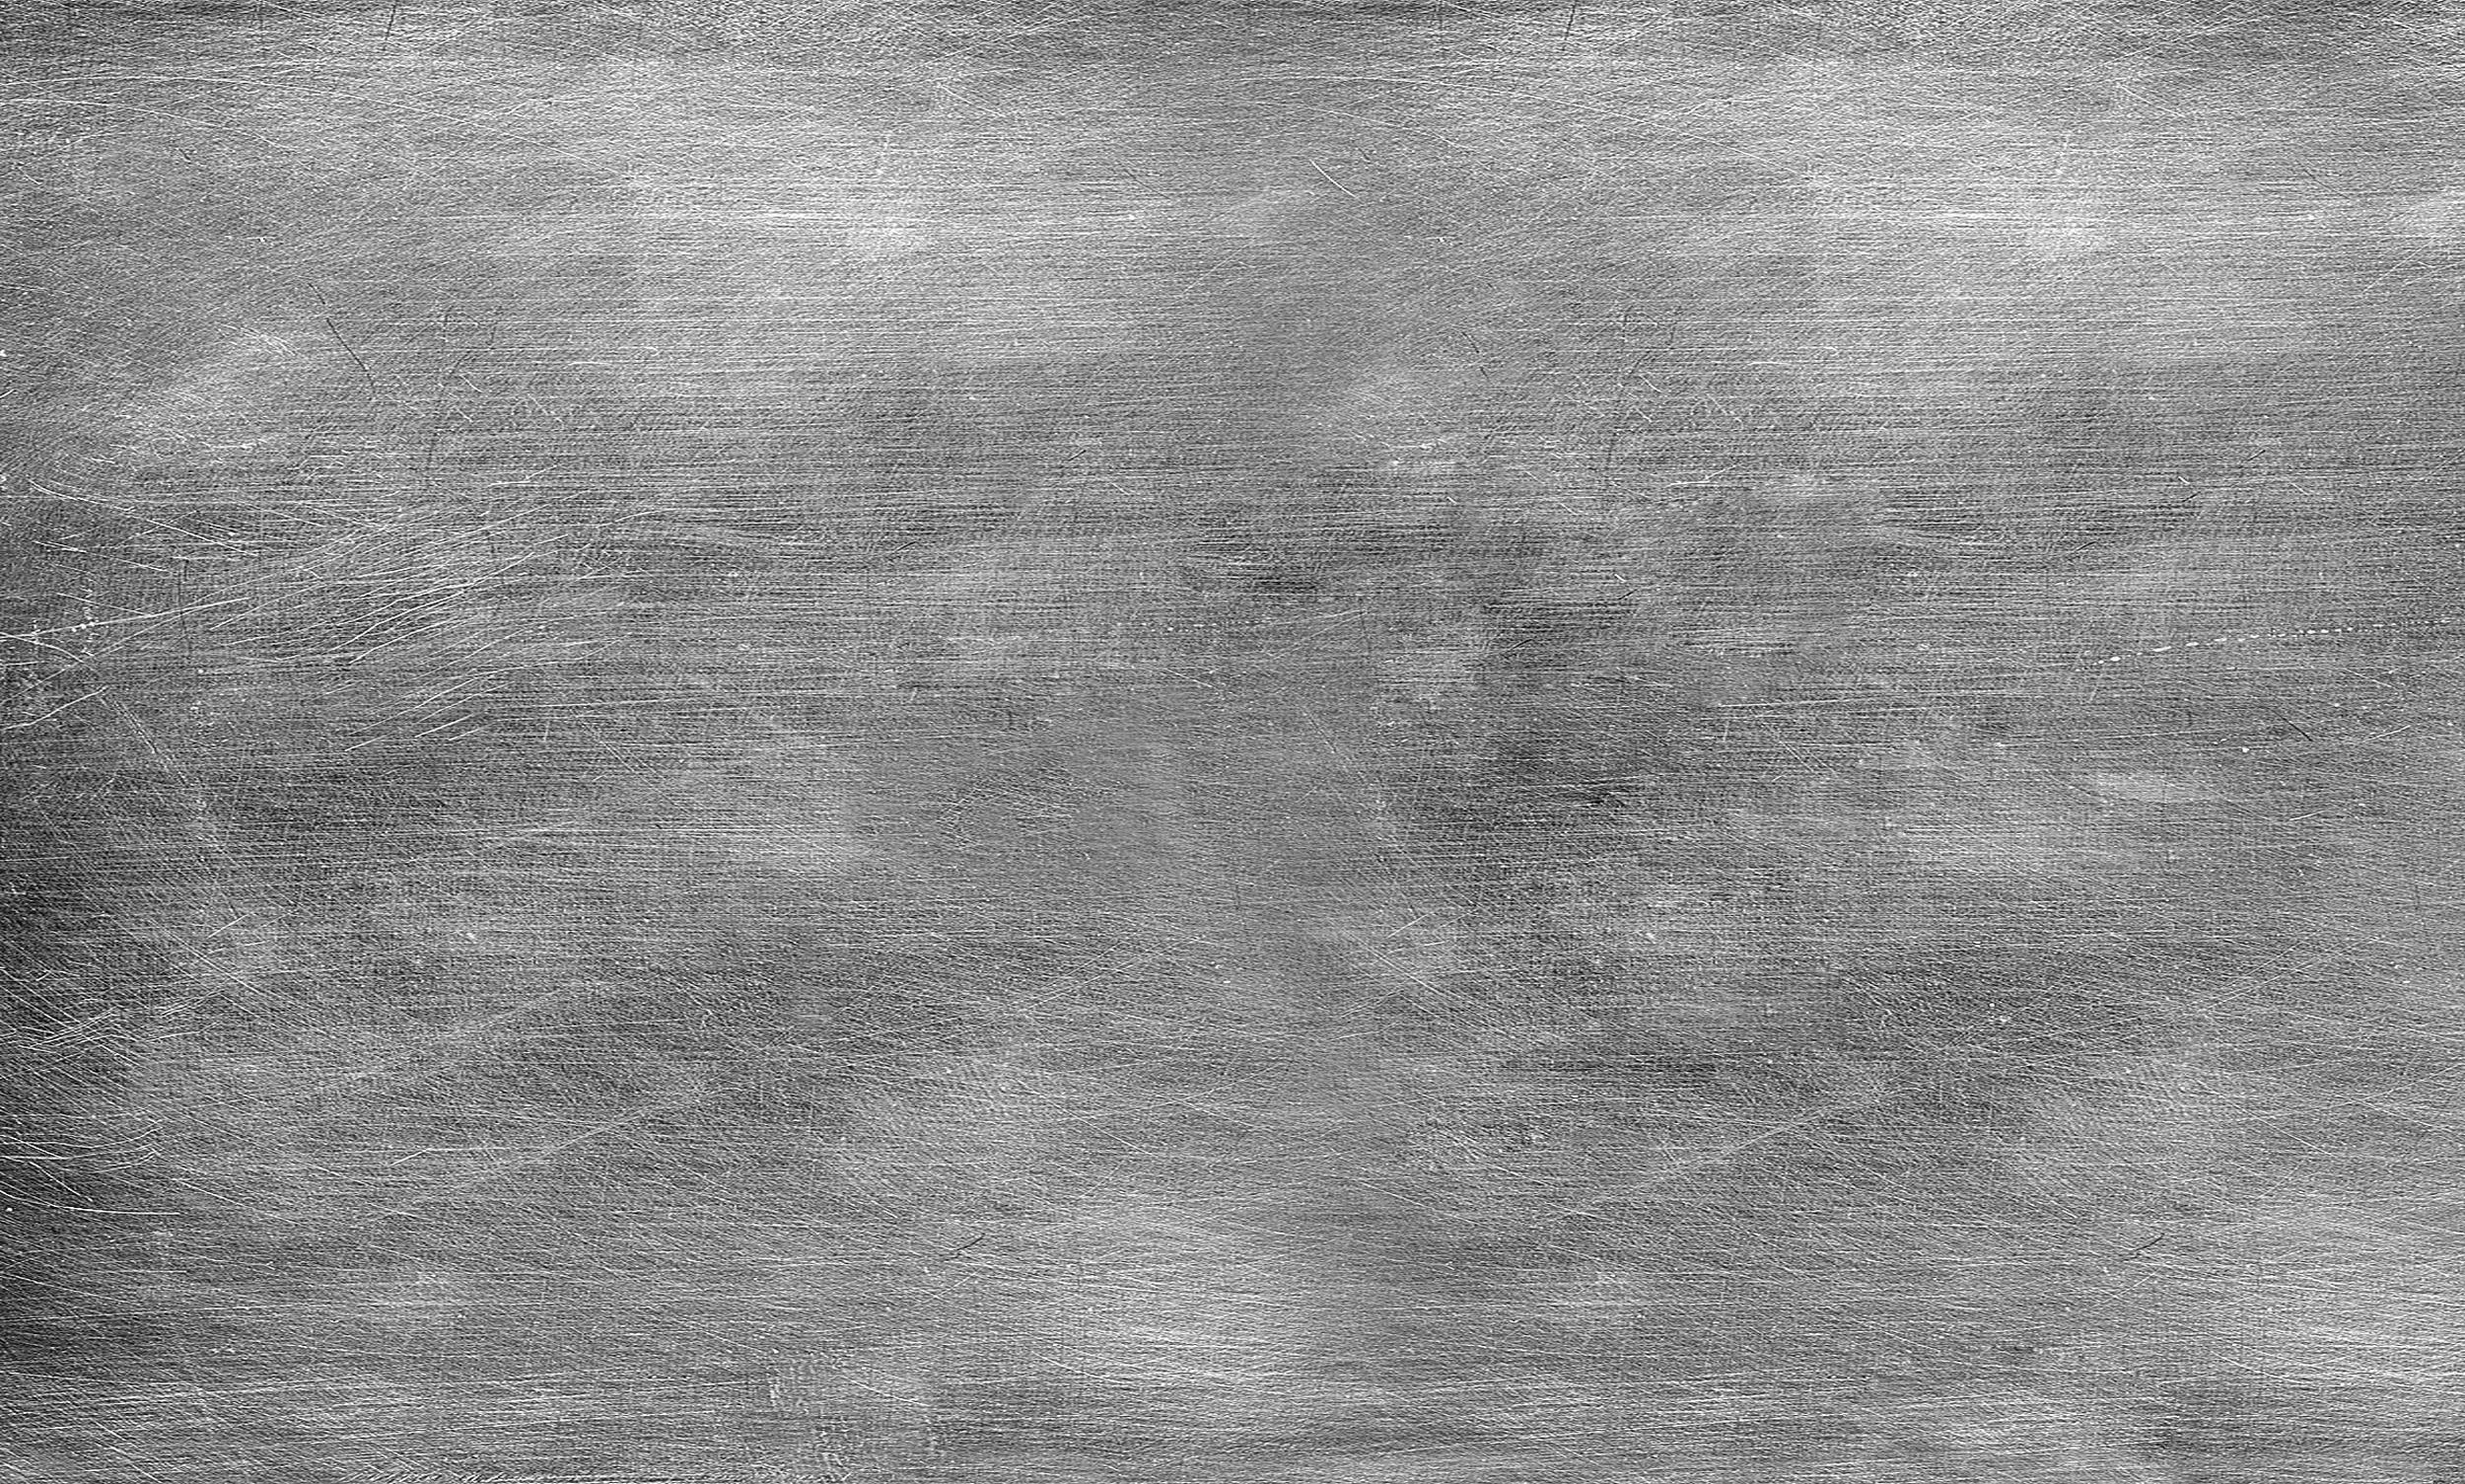 картинки  дерево текстура стена ржавчина Металл